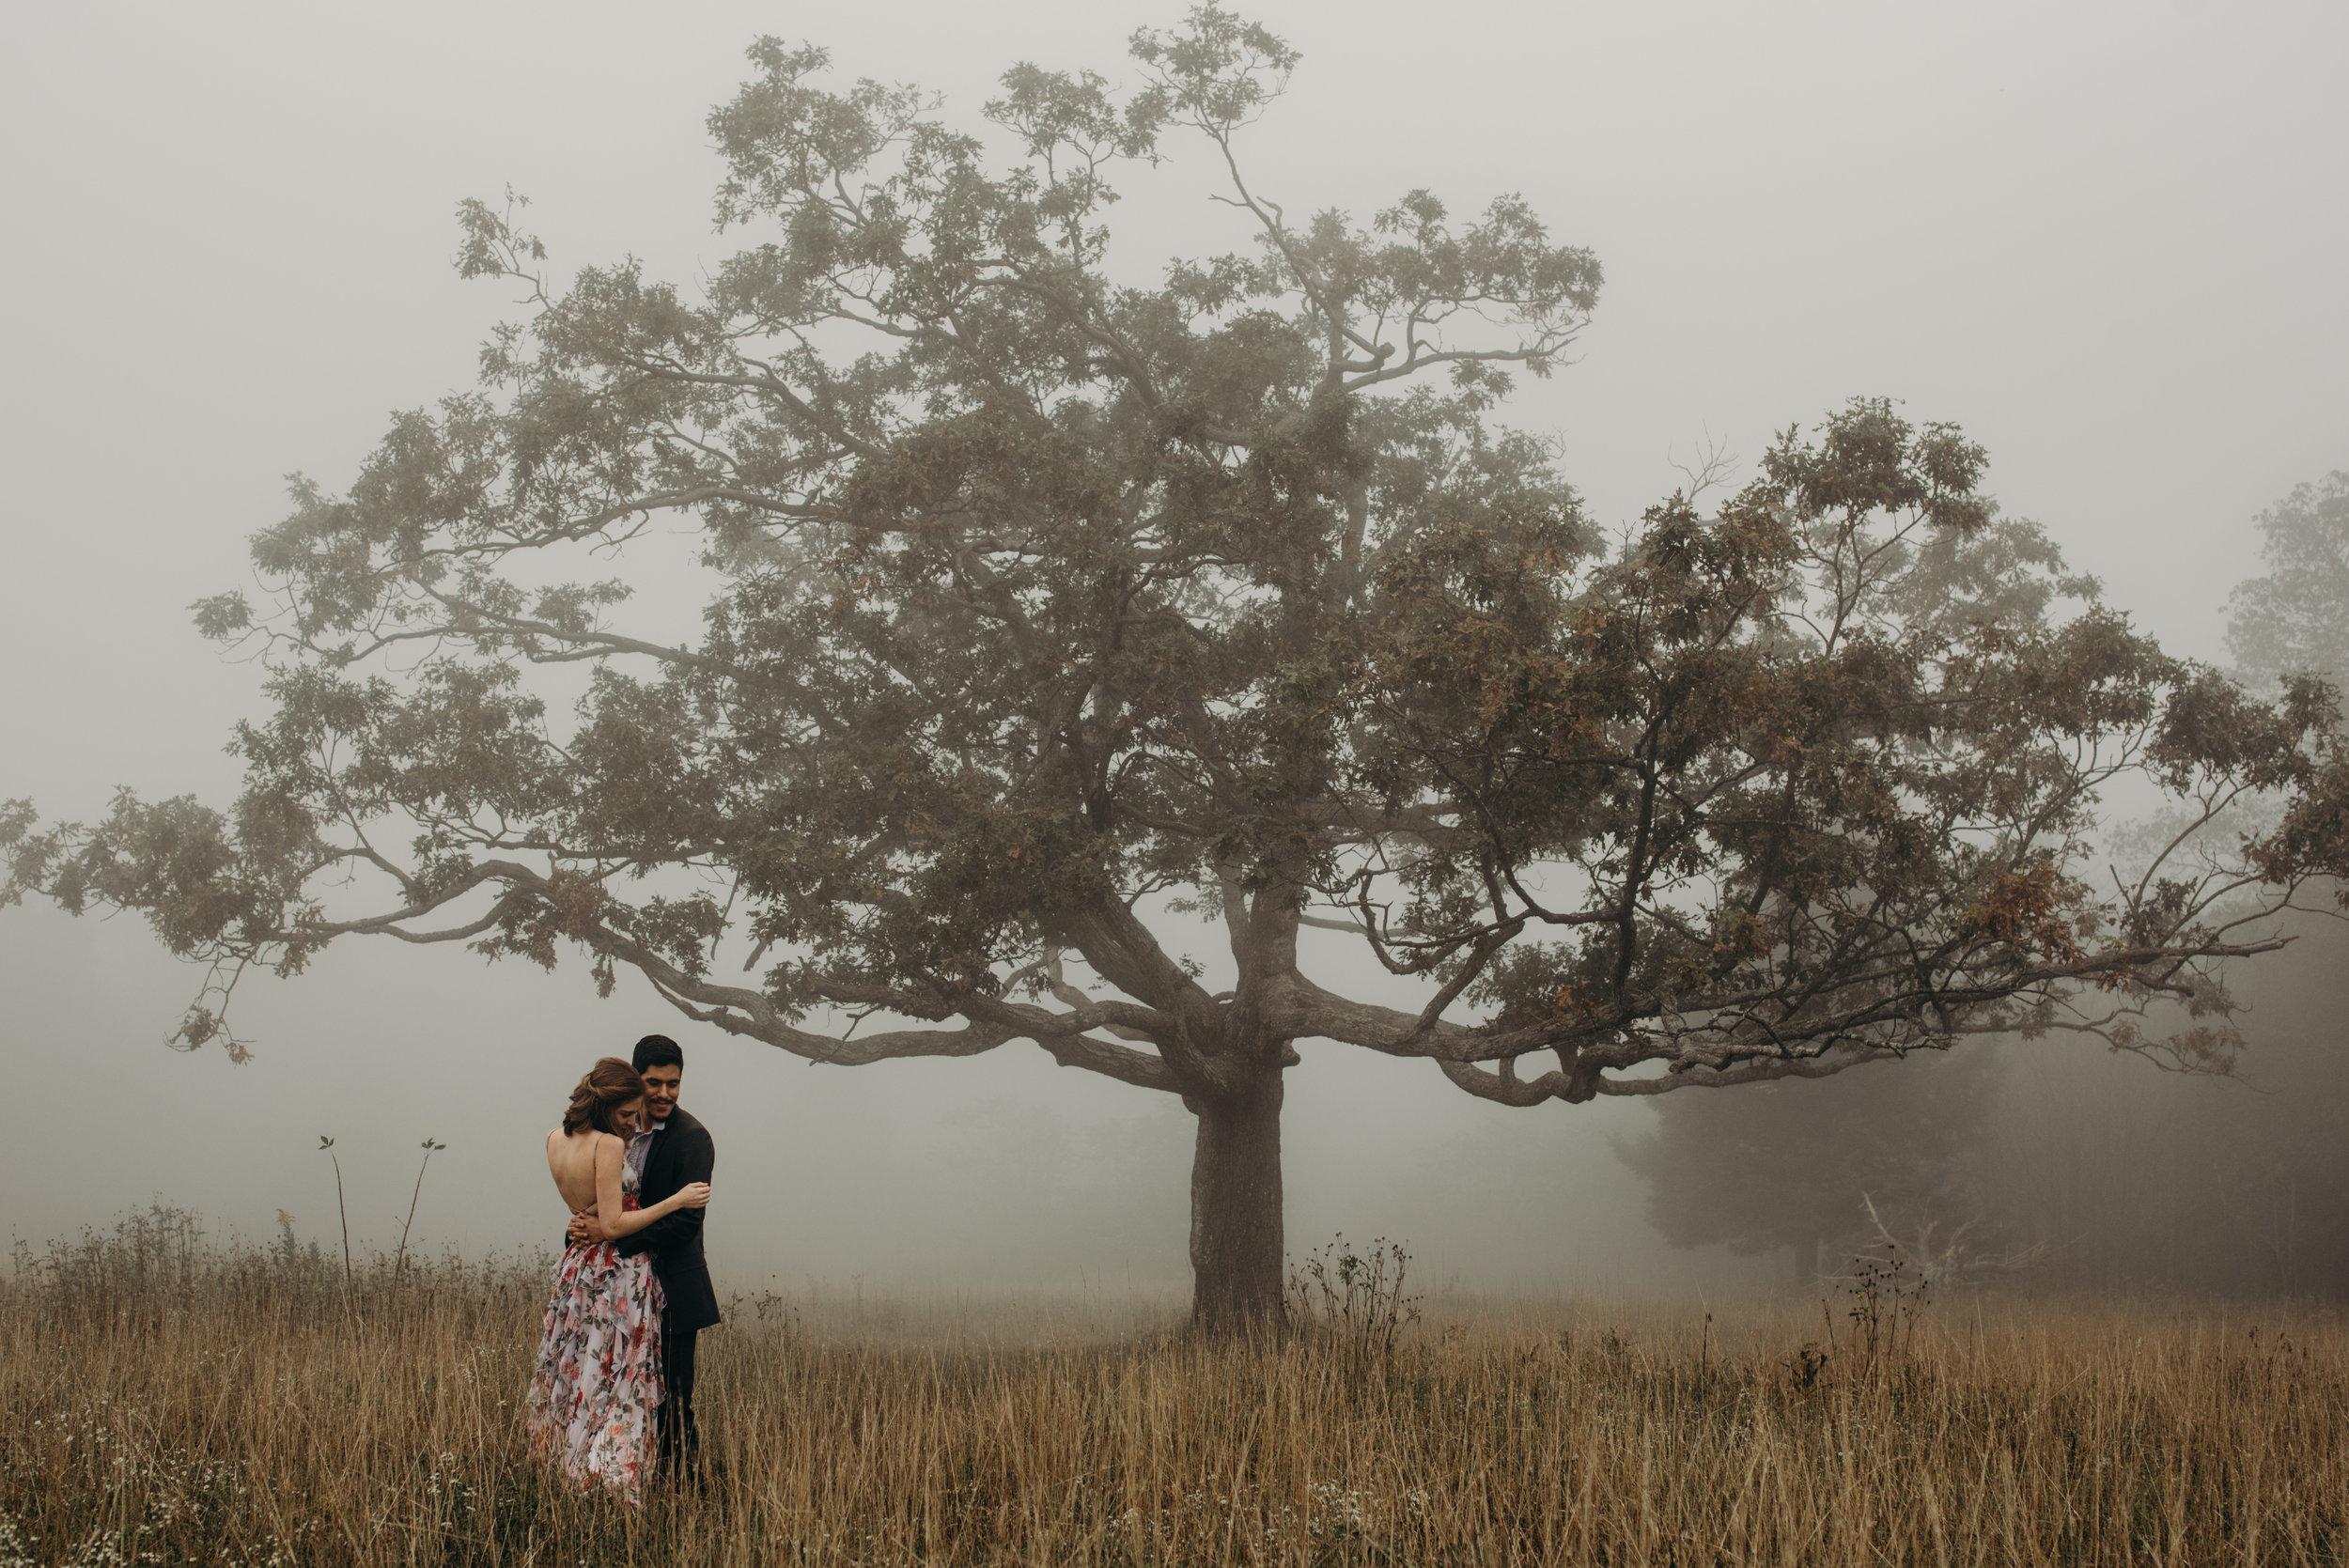 alvaro-sasha-skyline-drive-engagement-session-virginia-wedding-photographer-lindsey-paradiso-8394.jpg